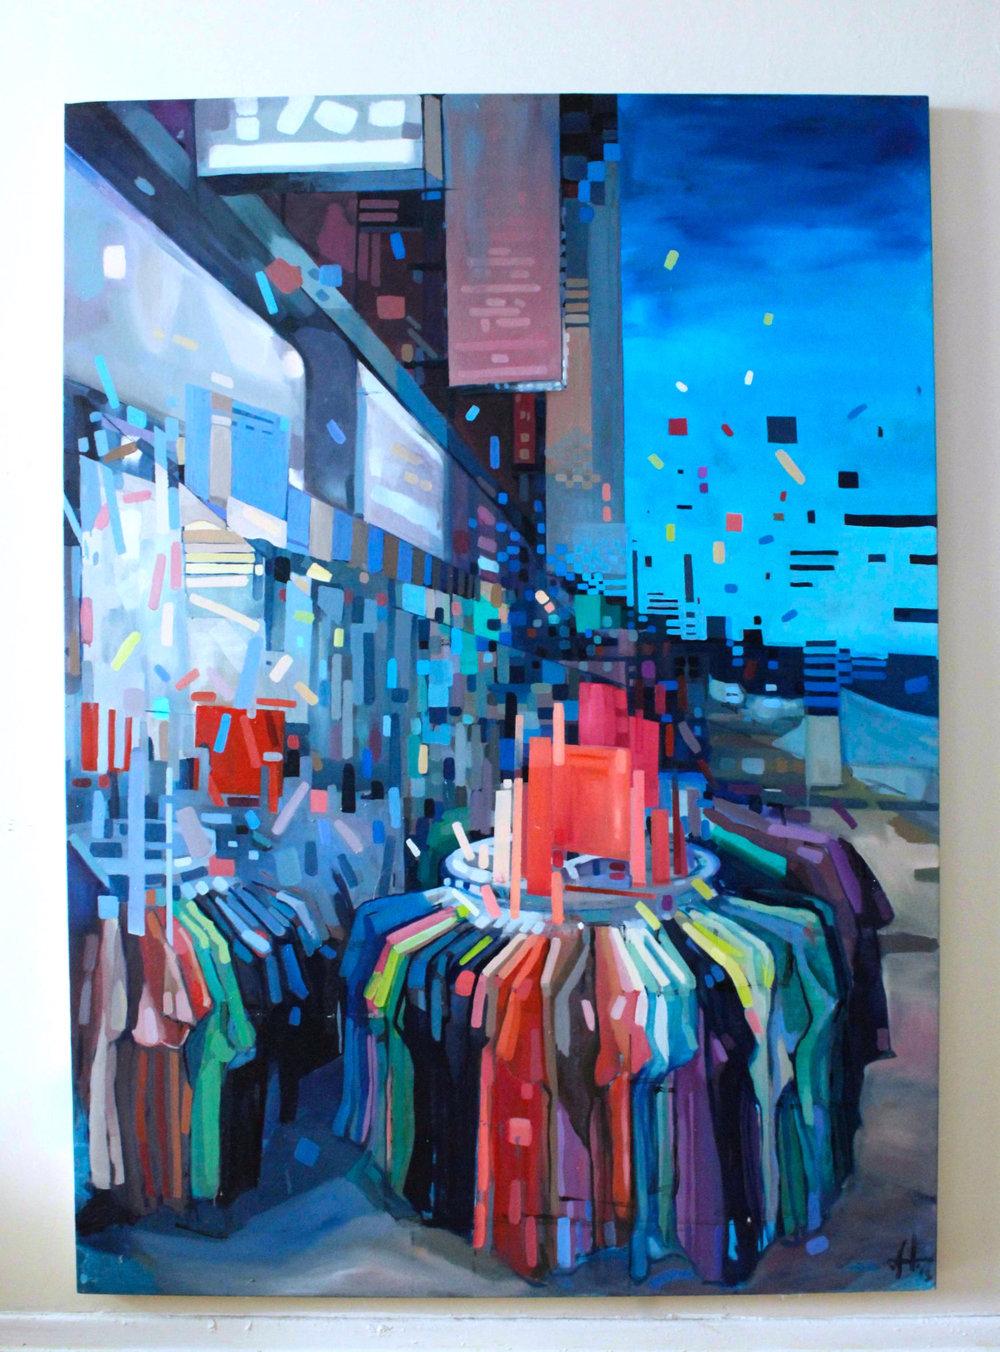 Copy of Summer in Kensington Market, 2014. Oil on canvas. 6'x4'